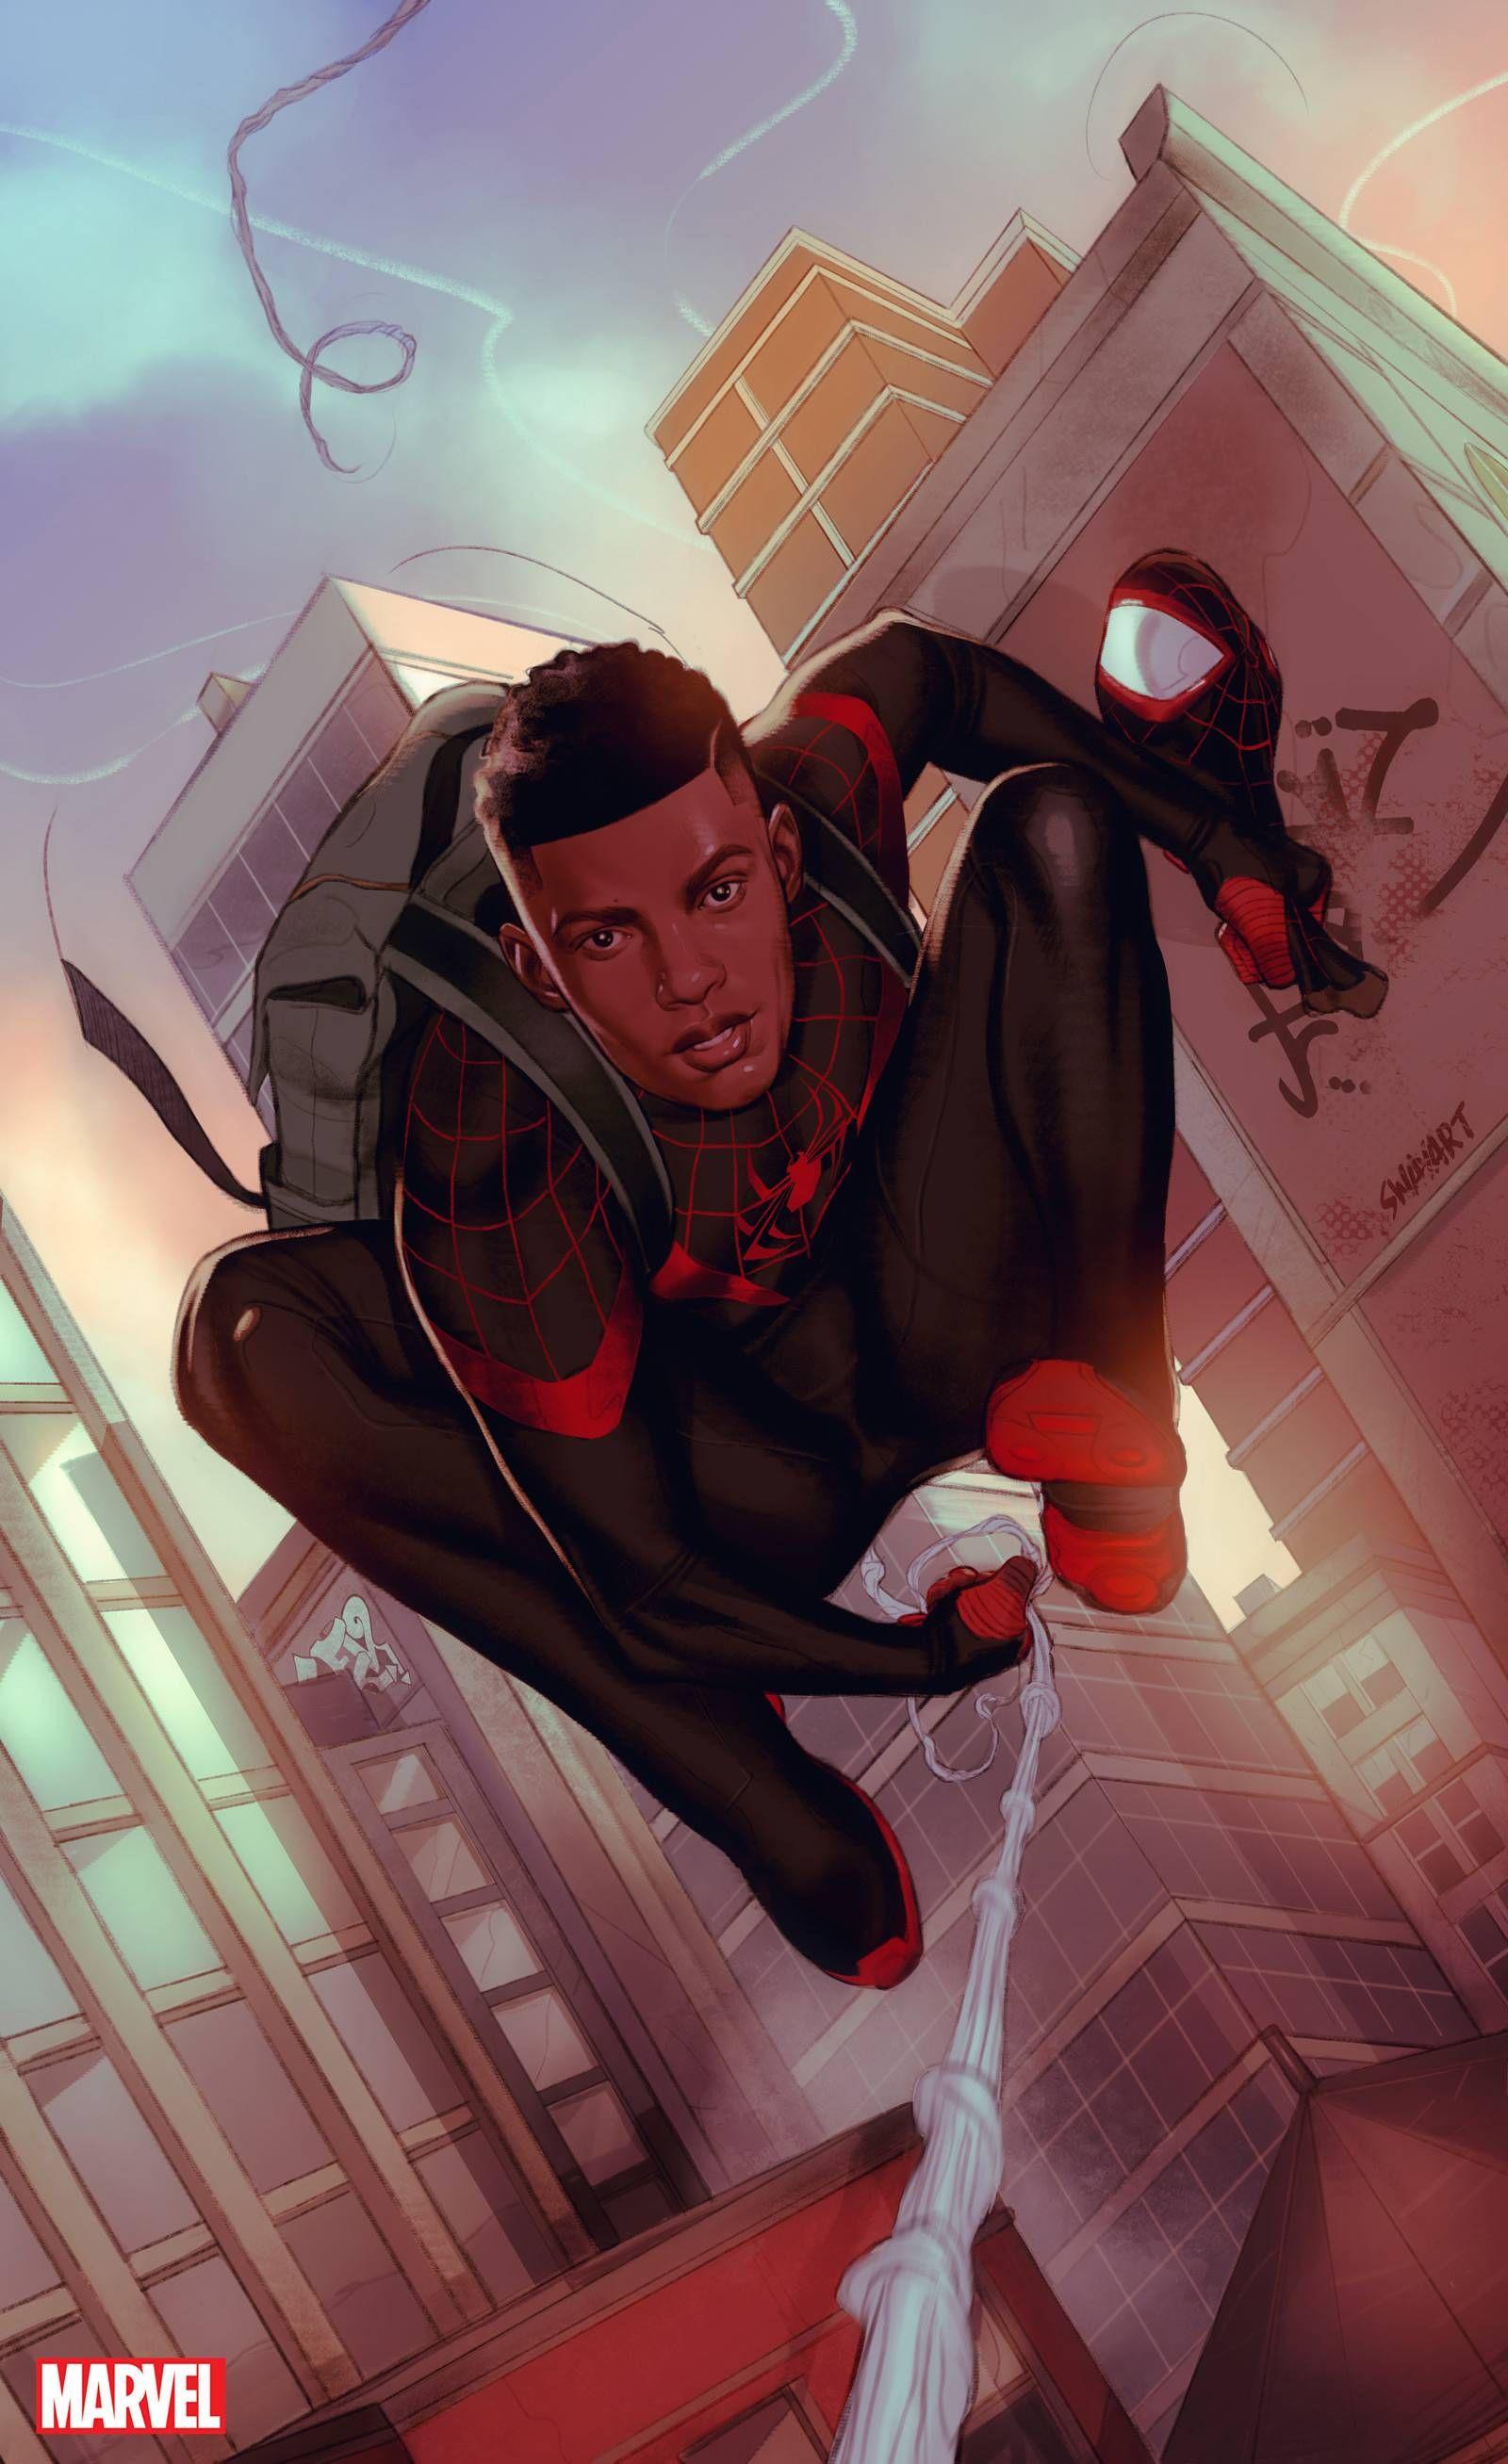 eyJidWNrZXQiOiJnb2NvbGxlY3QuaW1hZ2VzLnB1YiIsImtleSI6IjNhNmExZWE0LTgxNTYtNDEzOS04MDAzLTZkZTUwMGViNGU1Yy5qcGciLCJlZGl0cyI6W119 ComicList: Marvel Comics New Releases for 08/04/2021